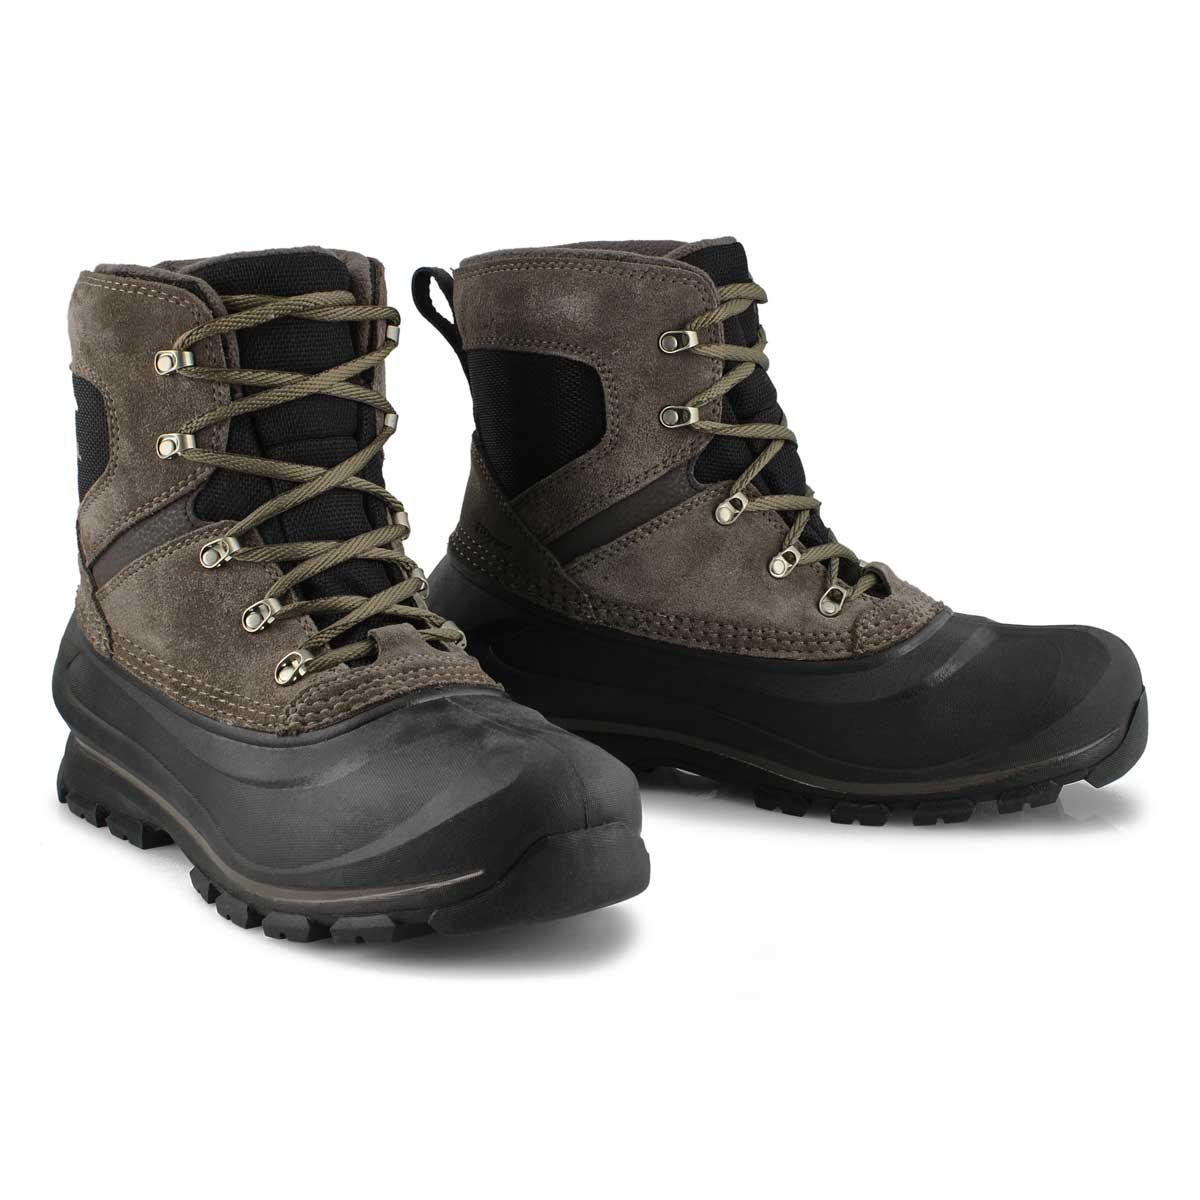 Mns Buxton Lace mjr/blk wtpf winter boot